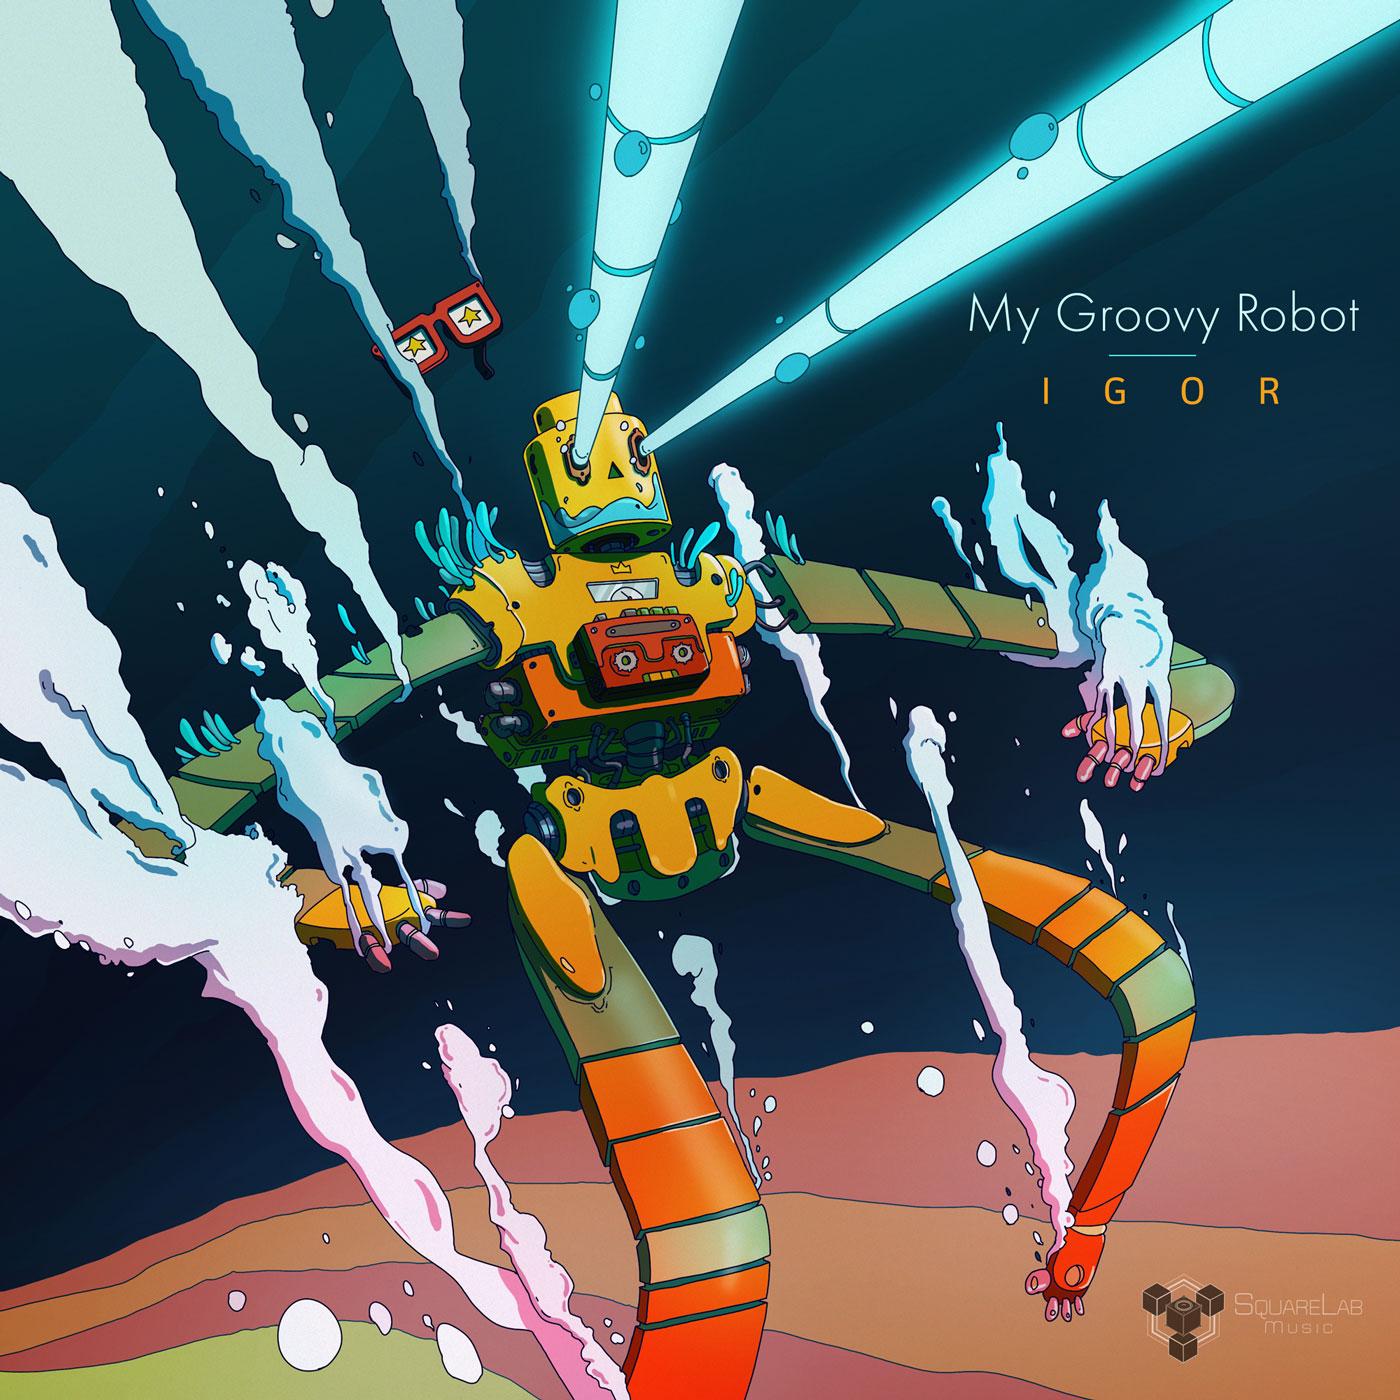 Igor, my groovy robot - cd cover - Illustration - Romain Laforet